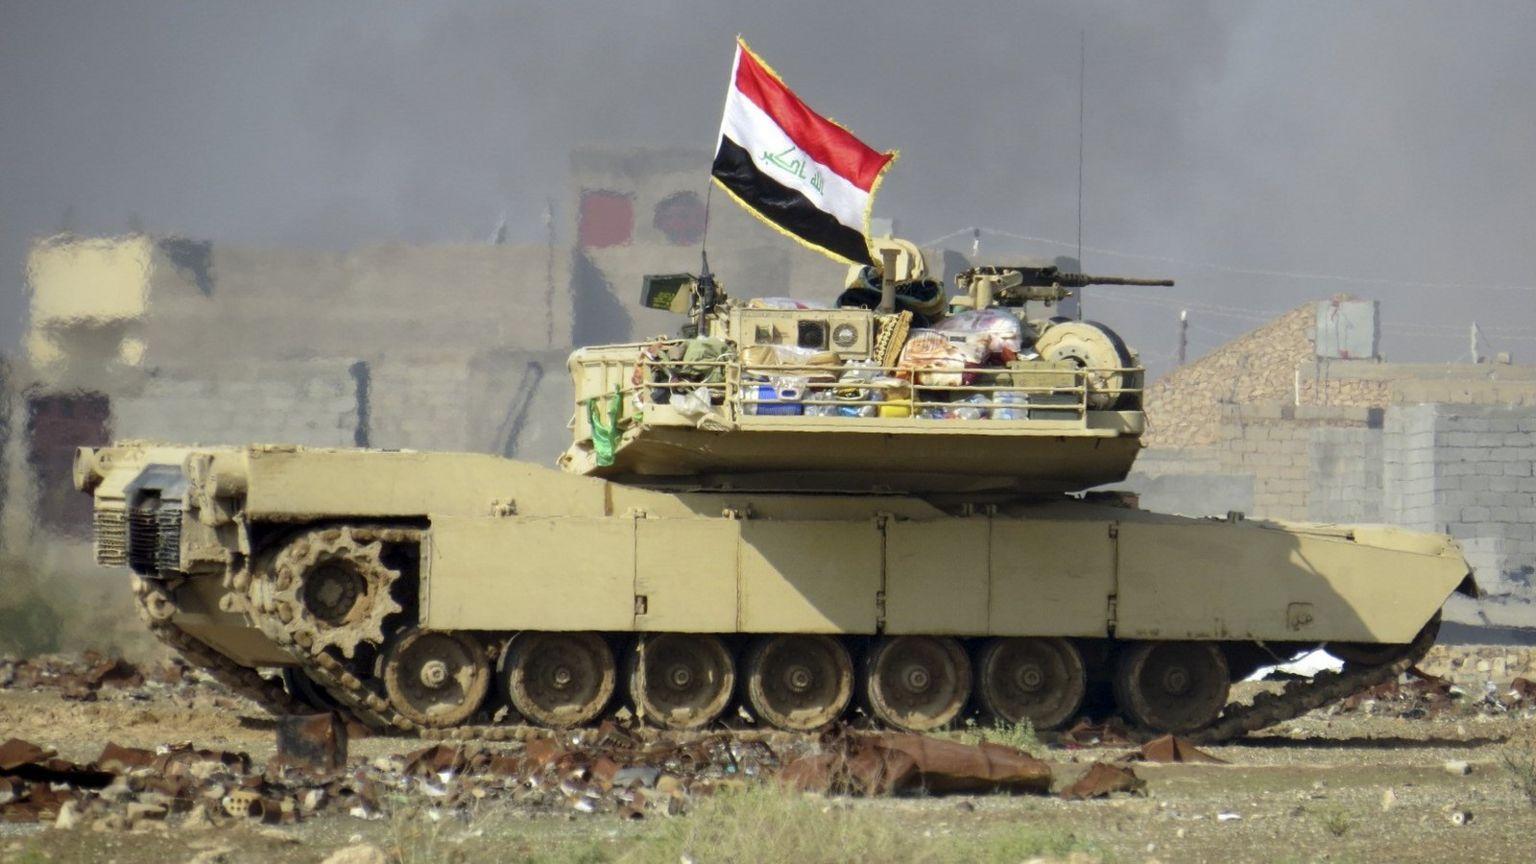 Iraqi army tank flies Iraqi national flag during battle in western suburbs of Ramadi (21 November 2015)